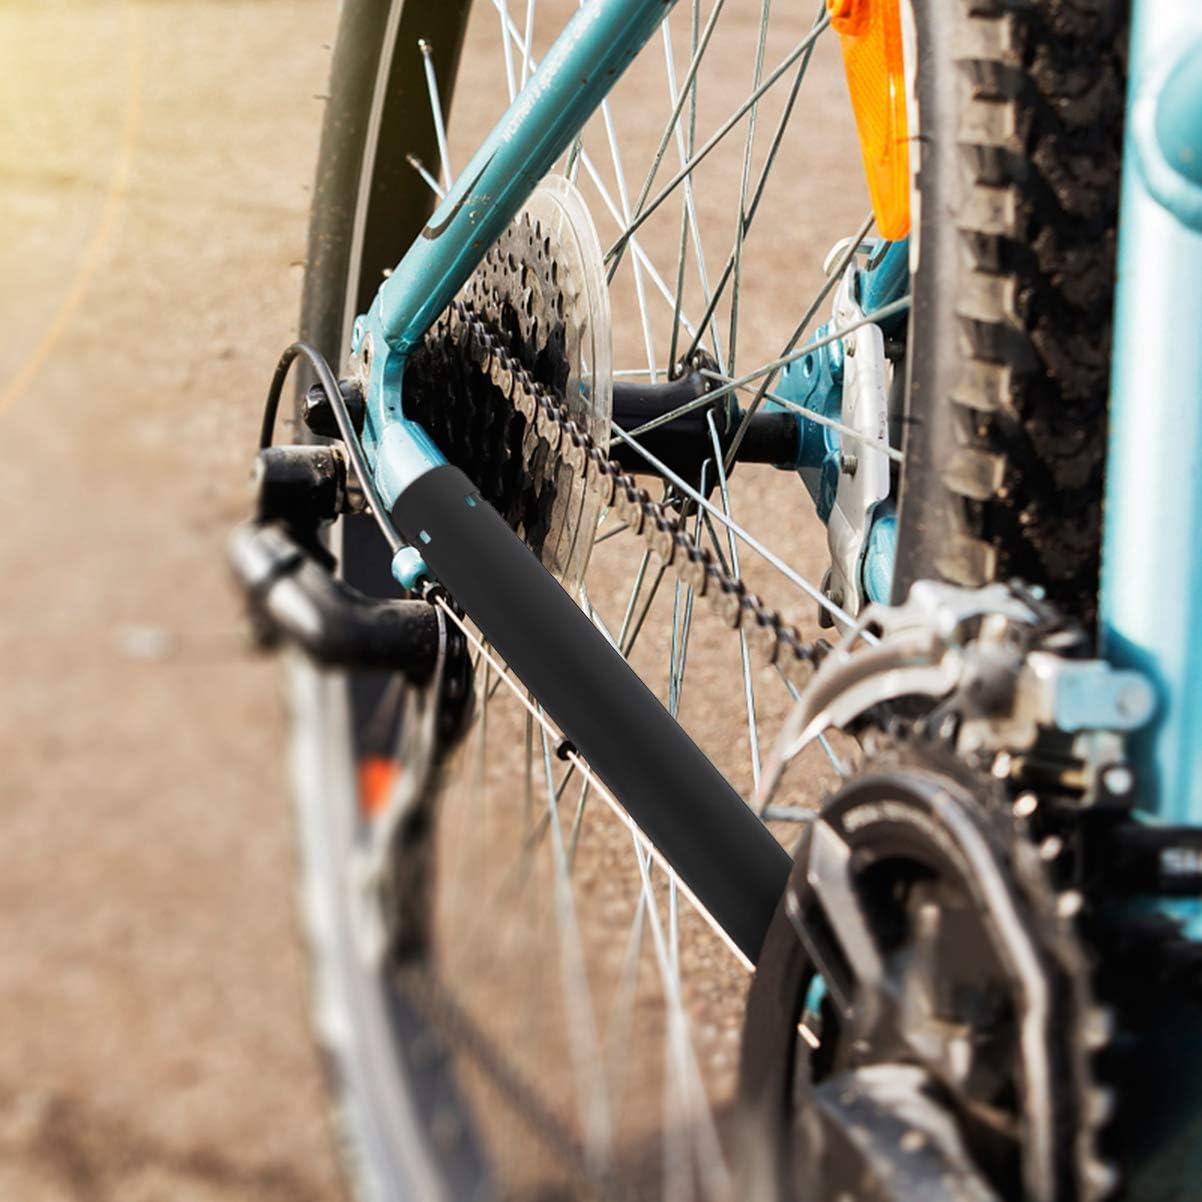 Black BESPORTBLE 4 Sets of Bike Chainstay Protector Plastic Bicycle Chain Frame Guard Bike Frame Cover for Mountain Bike Road Bike